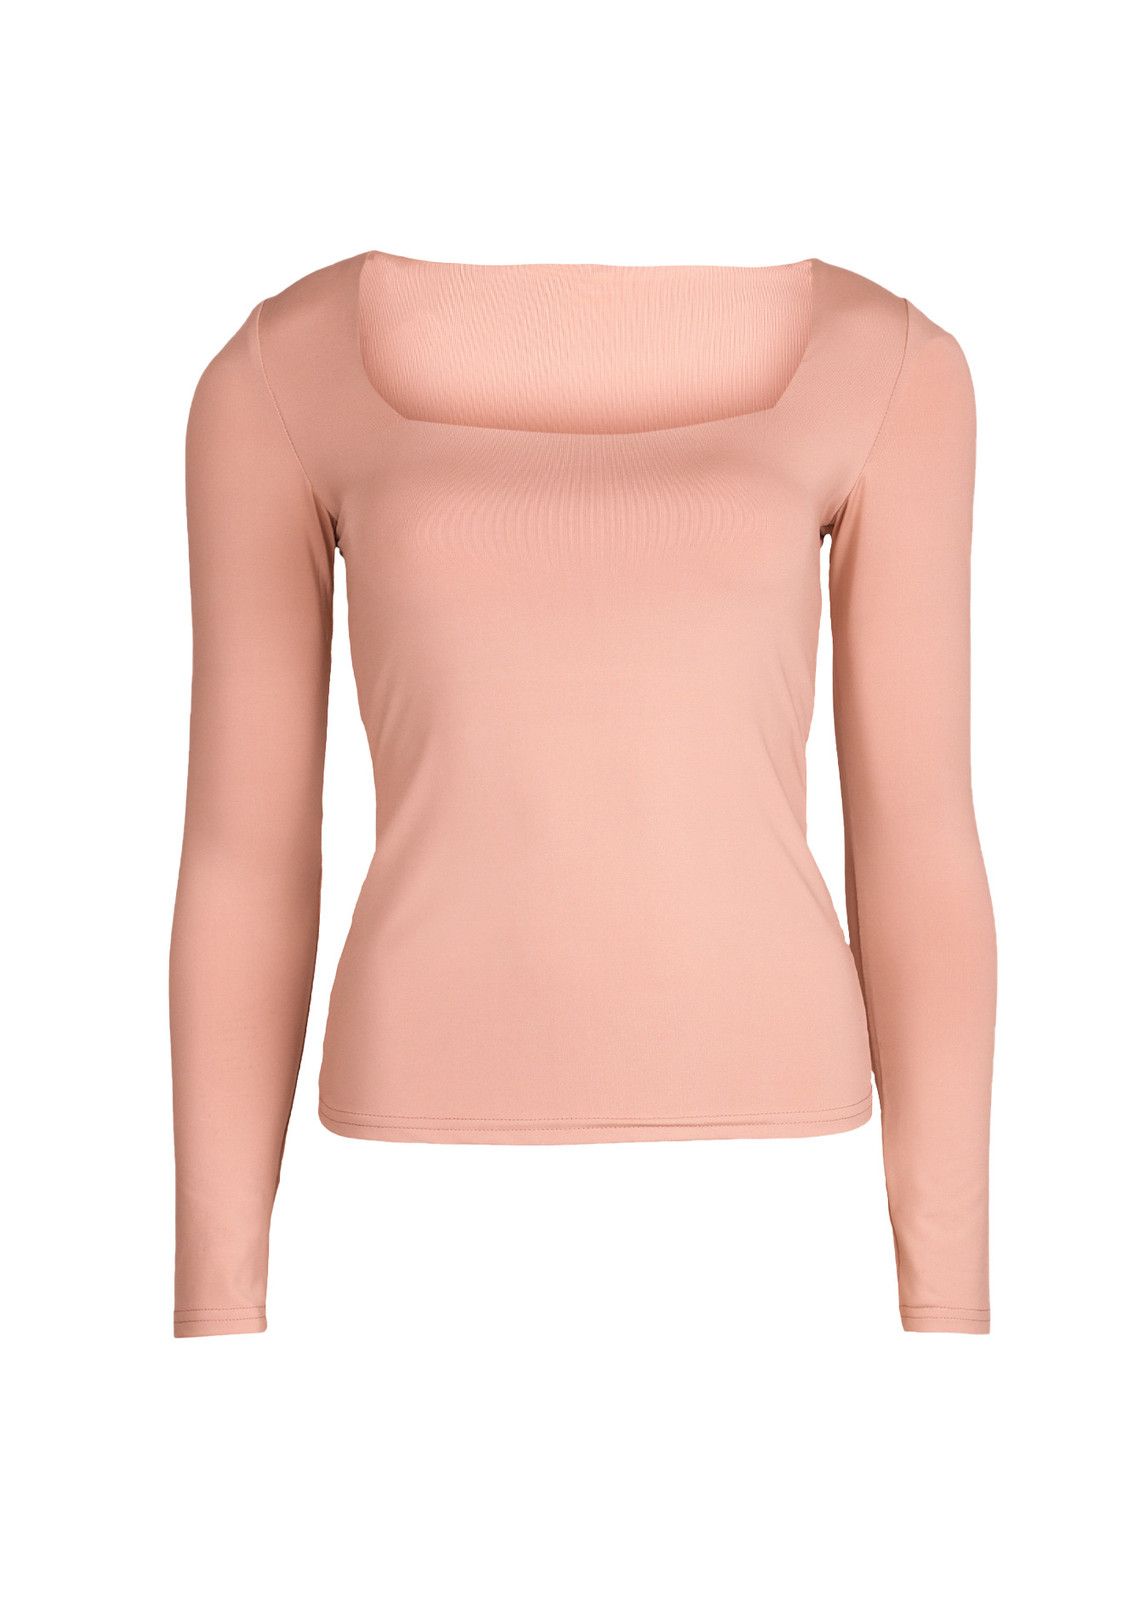 Basic stretch top Daisy peach